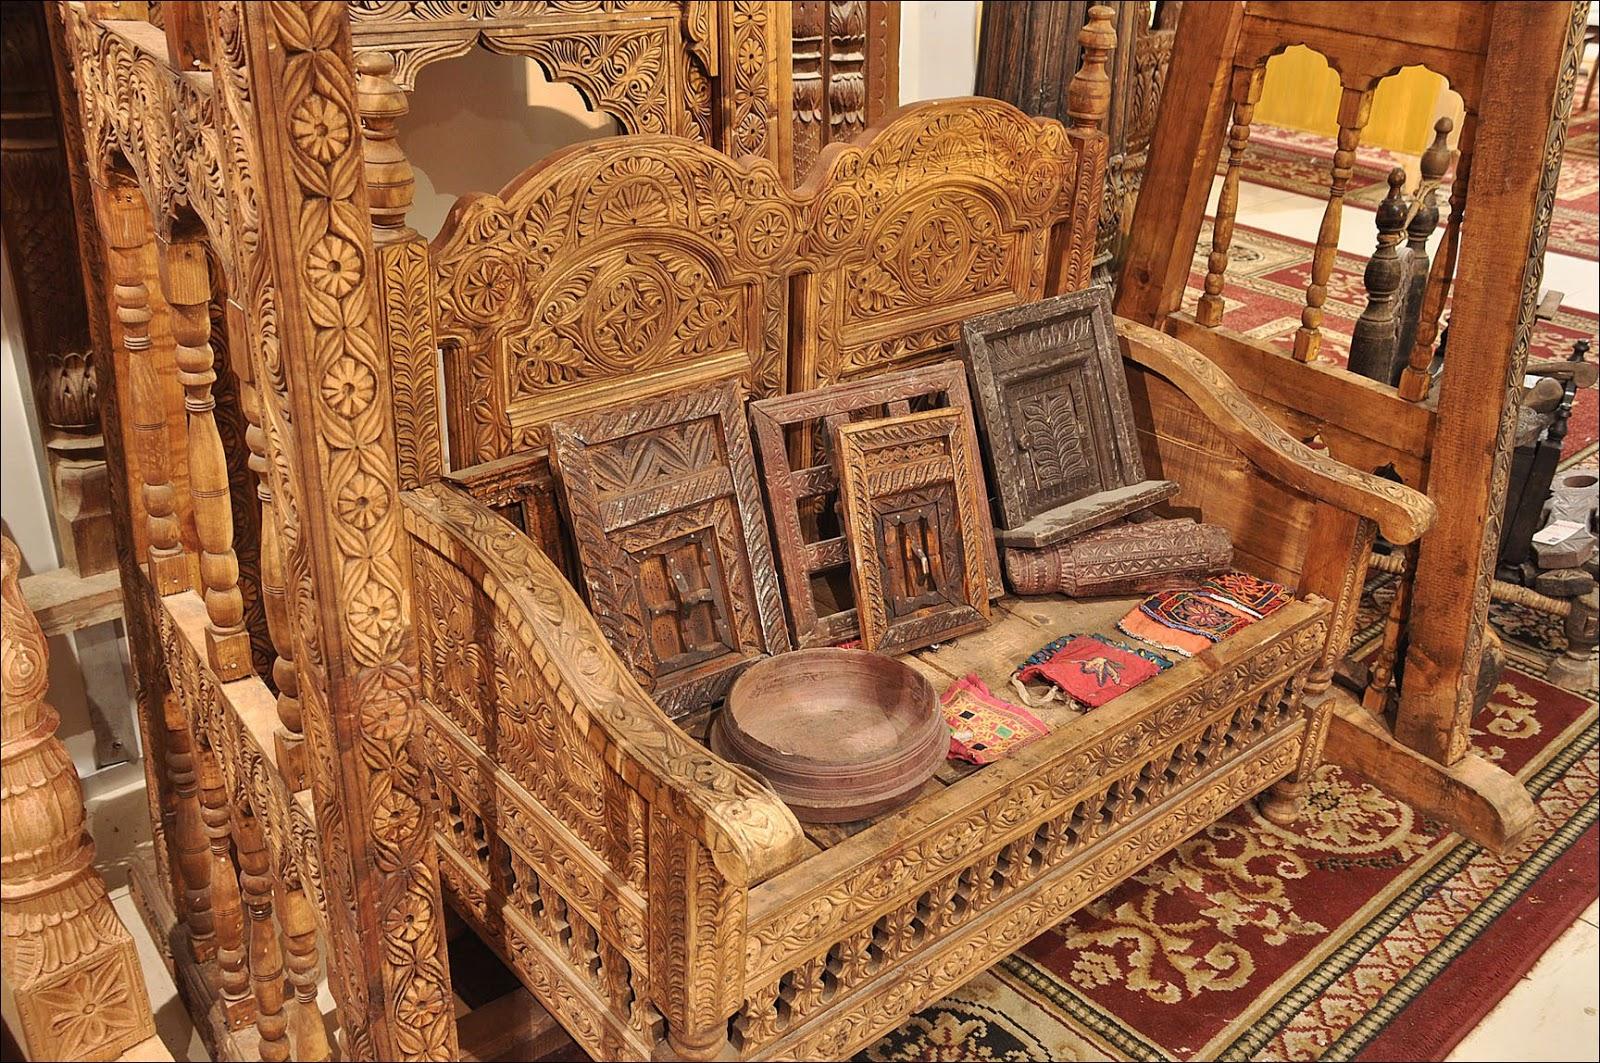 chair design in pakistan threshold tufted dining سوات کا لکڑی اور چمڑے فرنیچر اپنی مثال آپ travel sawat